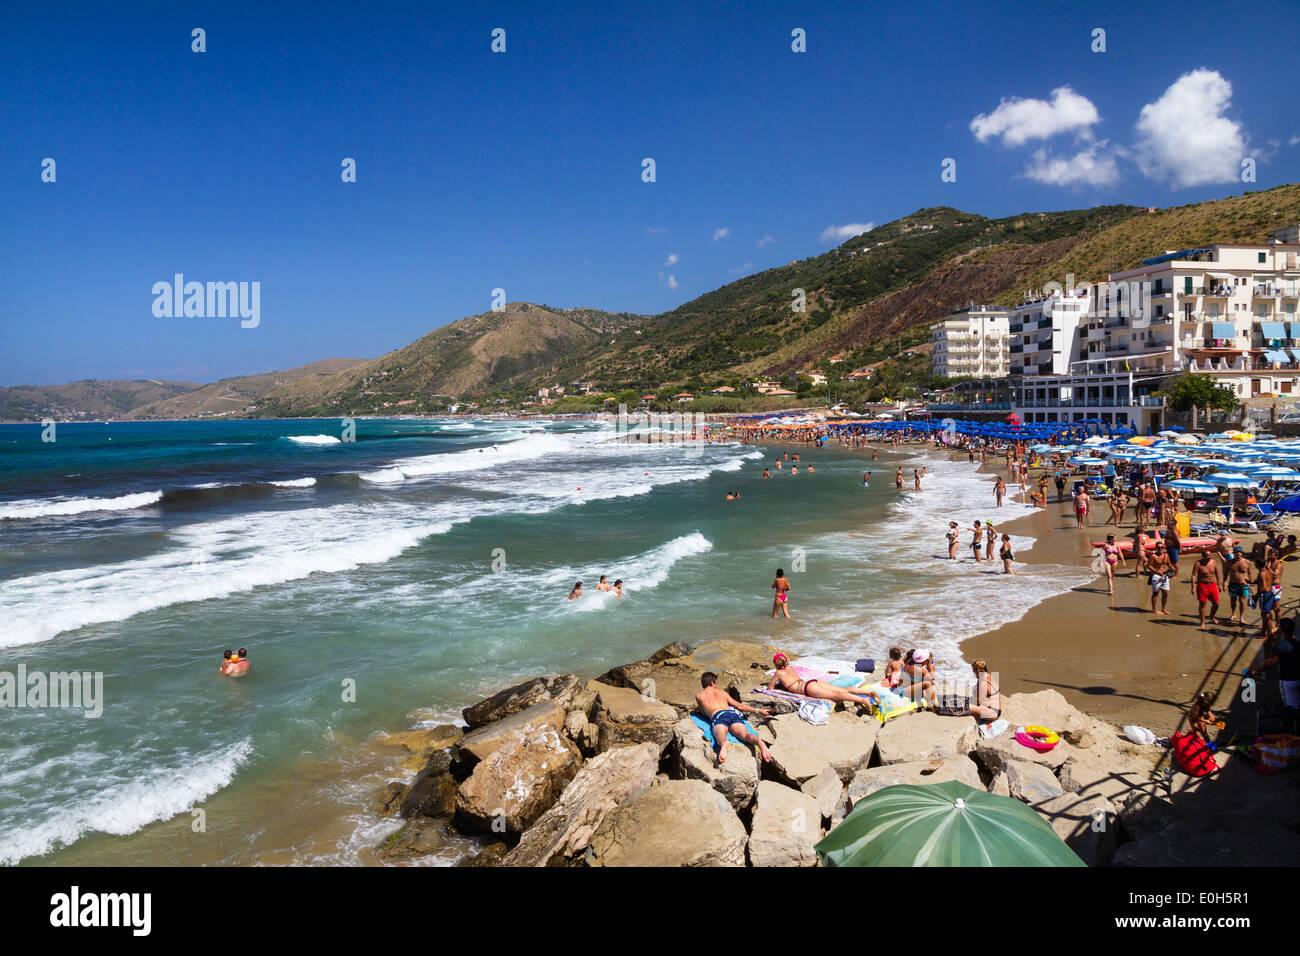 Acciaroli beach, Tyrrhenian Sea, Campania, Mediterranean, Southern Italy, Europe - Stock Image